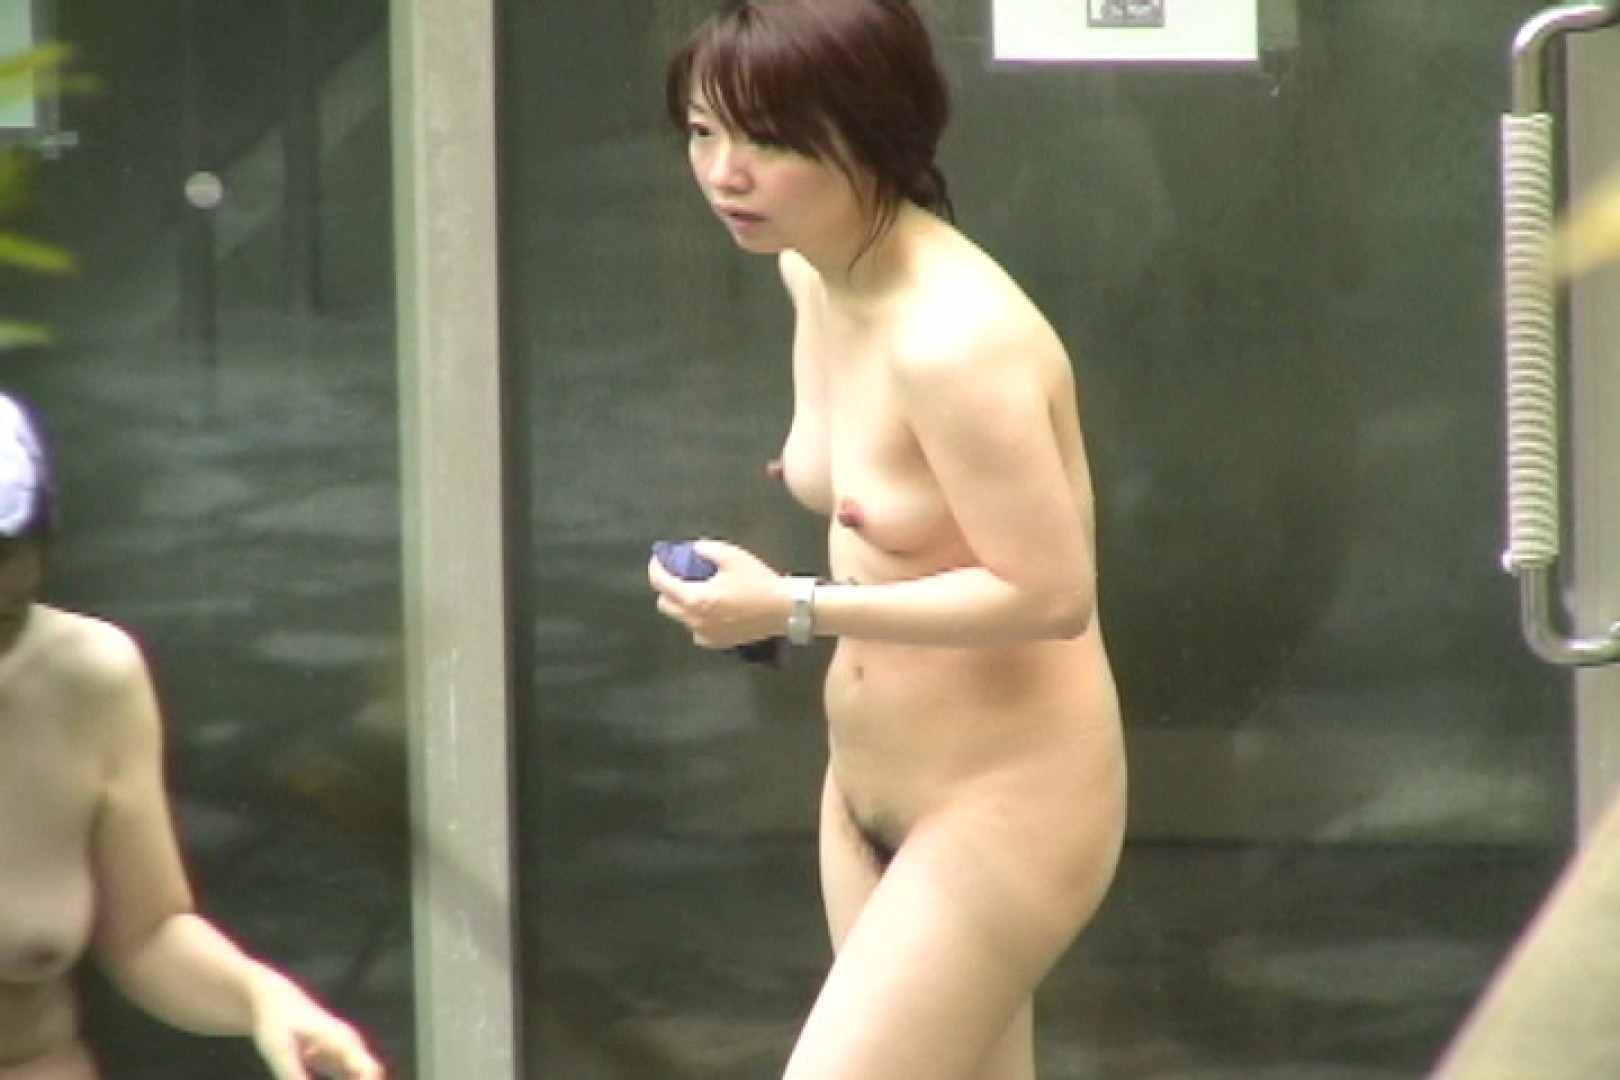 Aquaな露天風呂Vol.700 エッチな盗撮  90pic 6